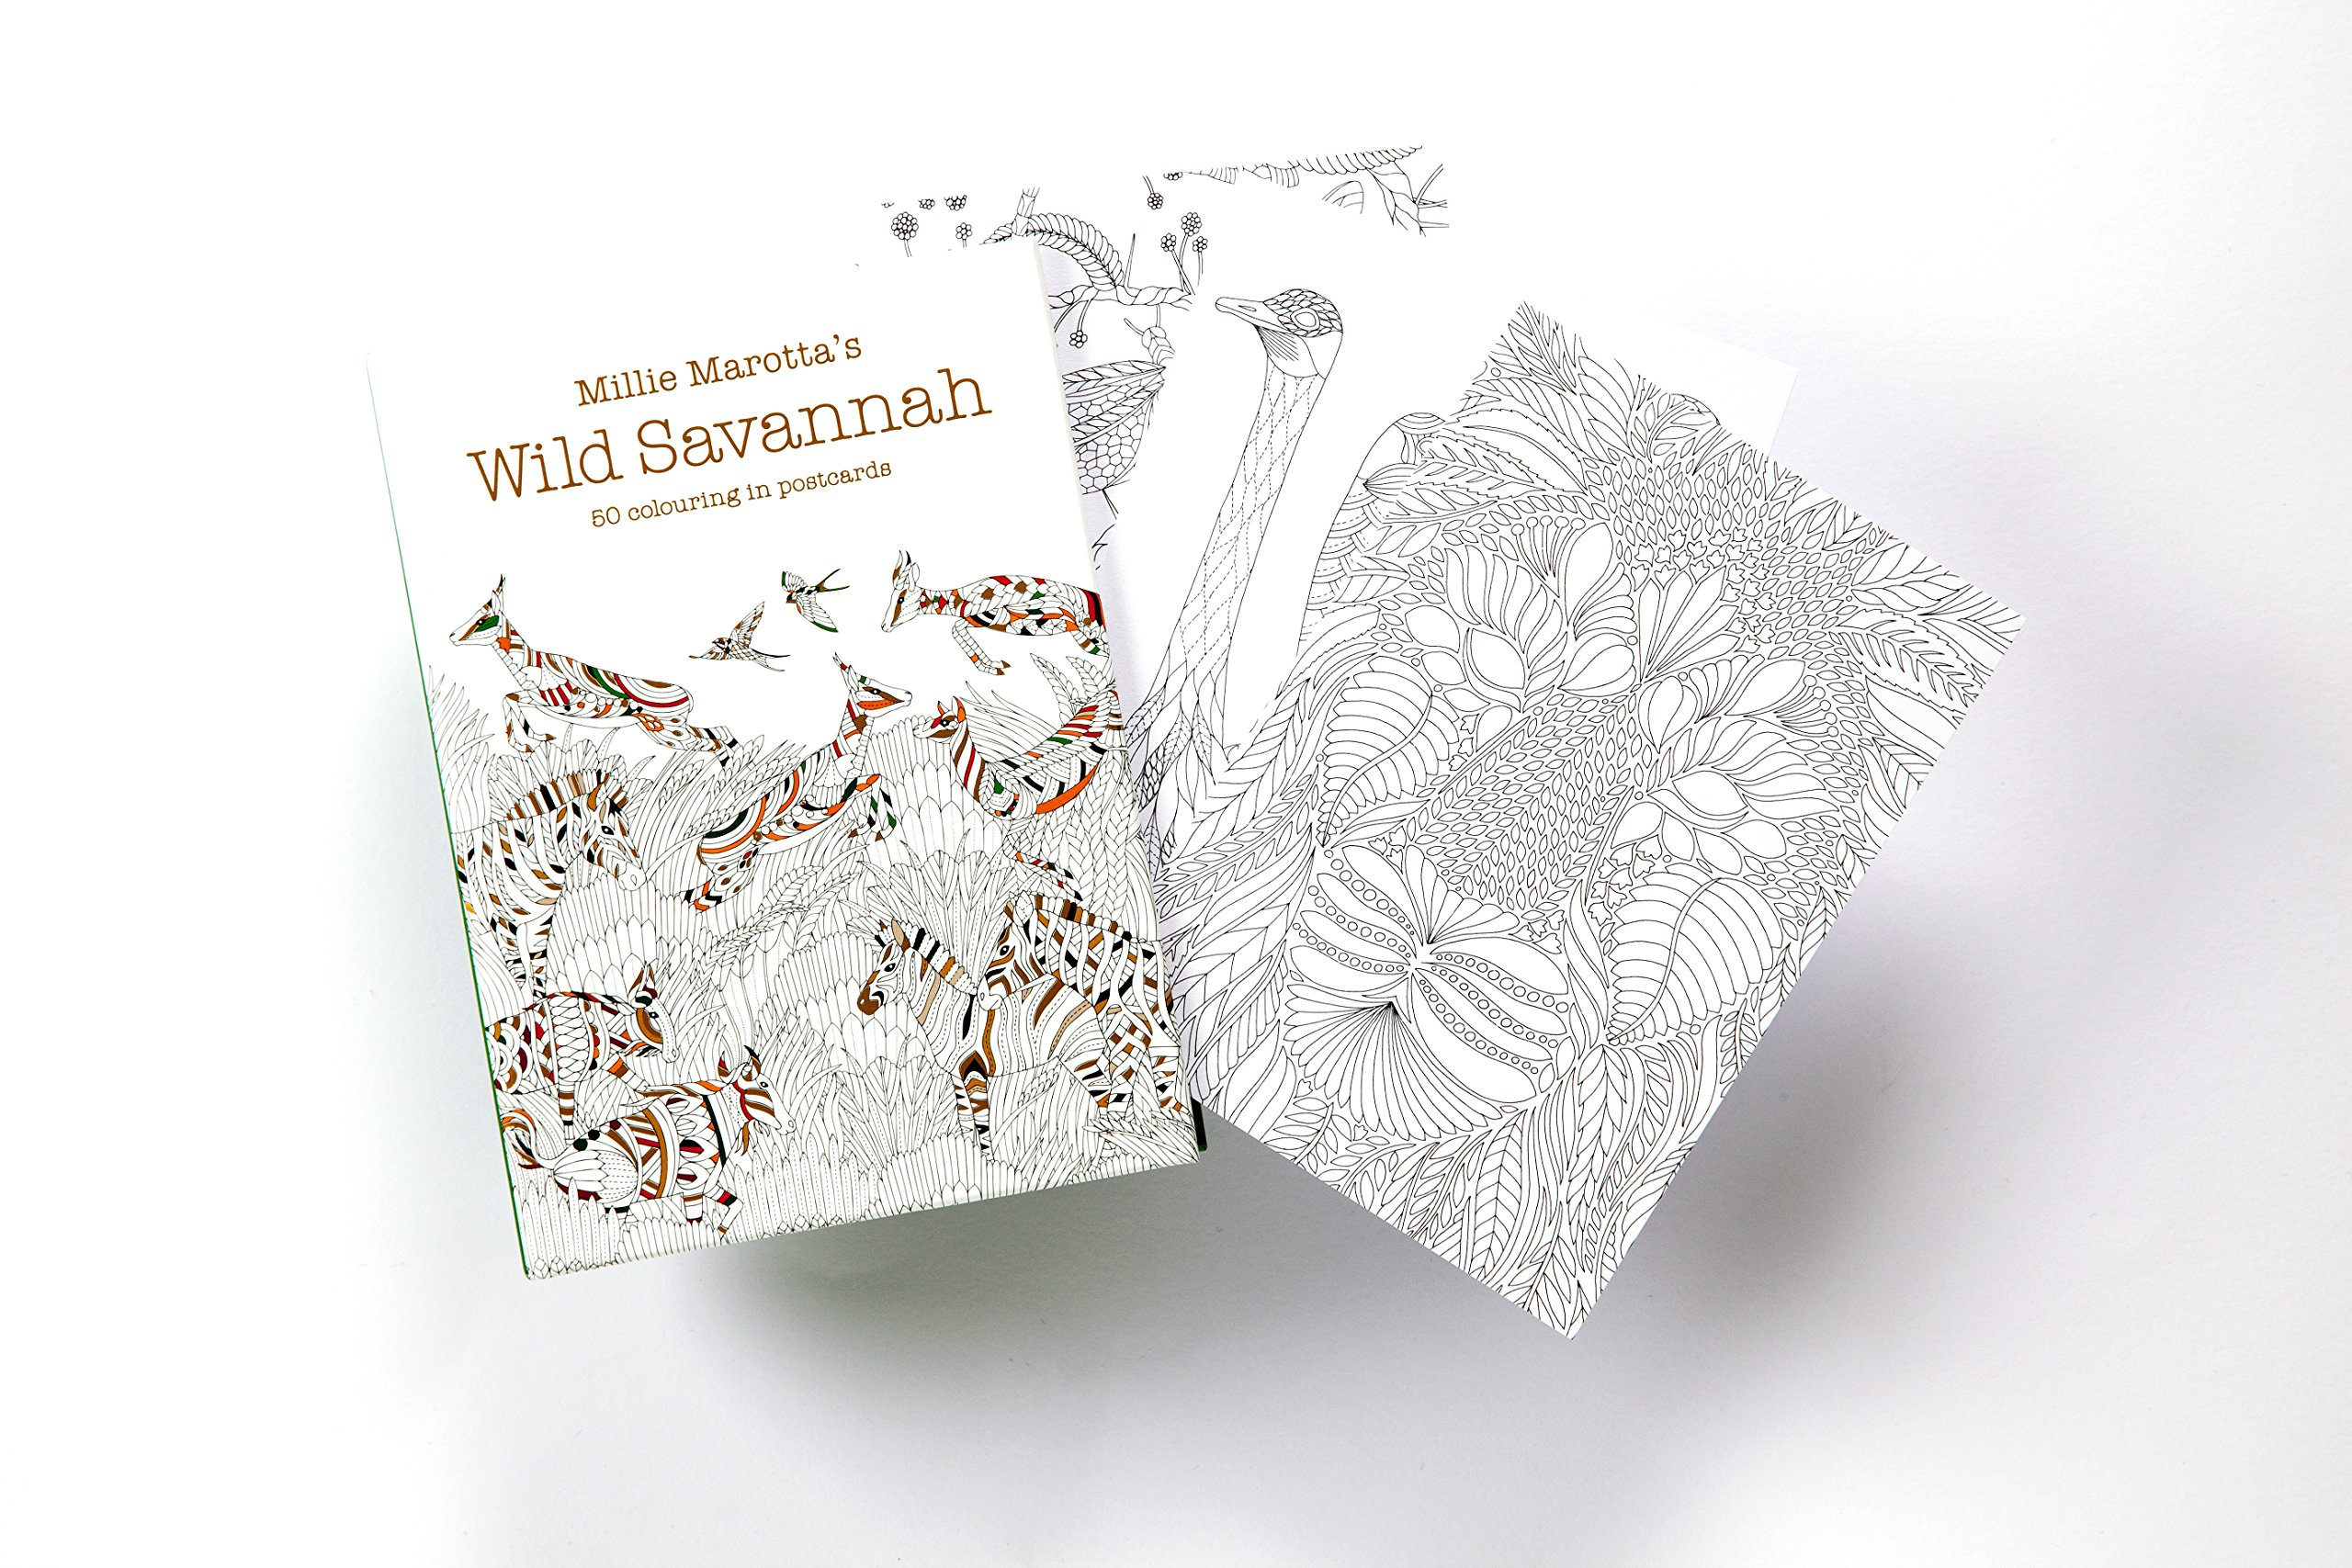 Millie Marottas Wild Savannah Postcard Box Amazoncouk Marotta 9781849943796 Books